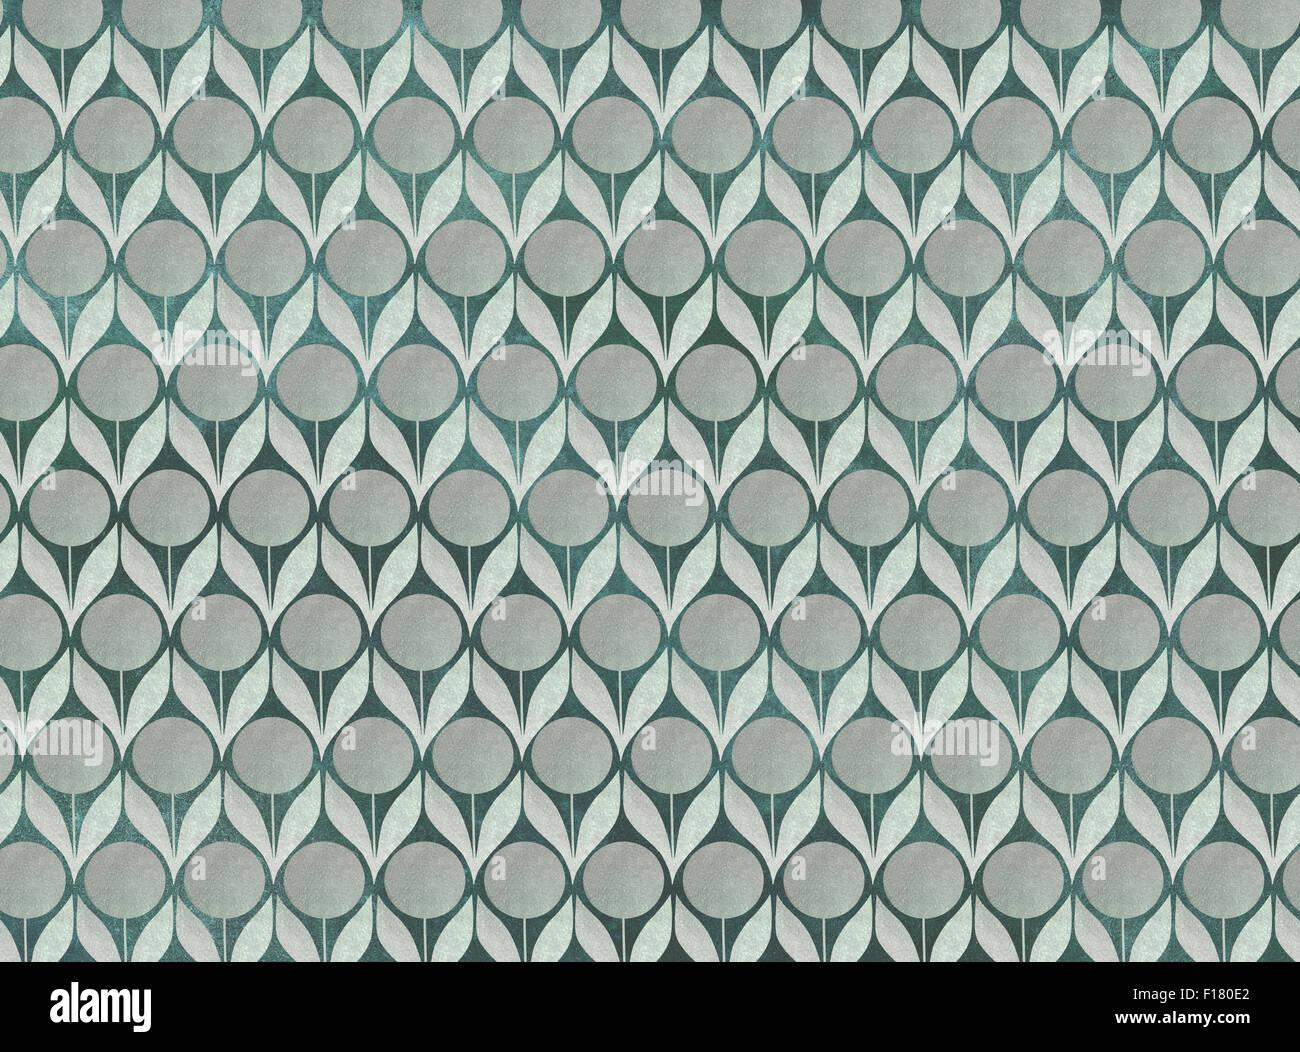 Seamless flower pattern background - Stock Image